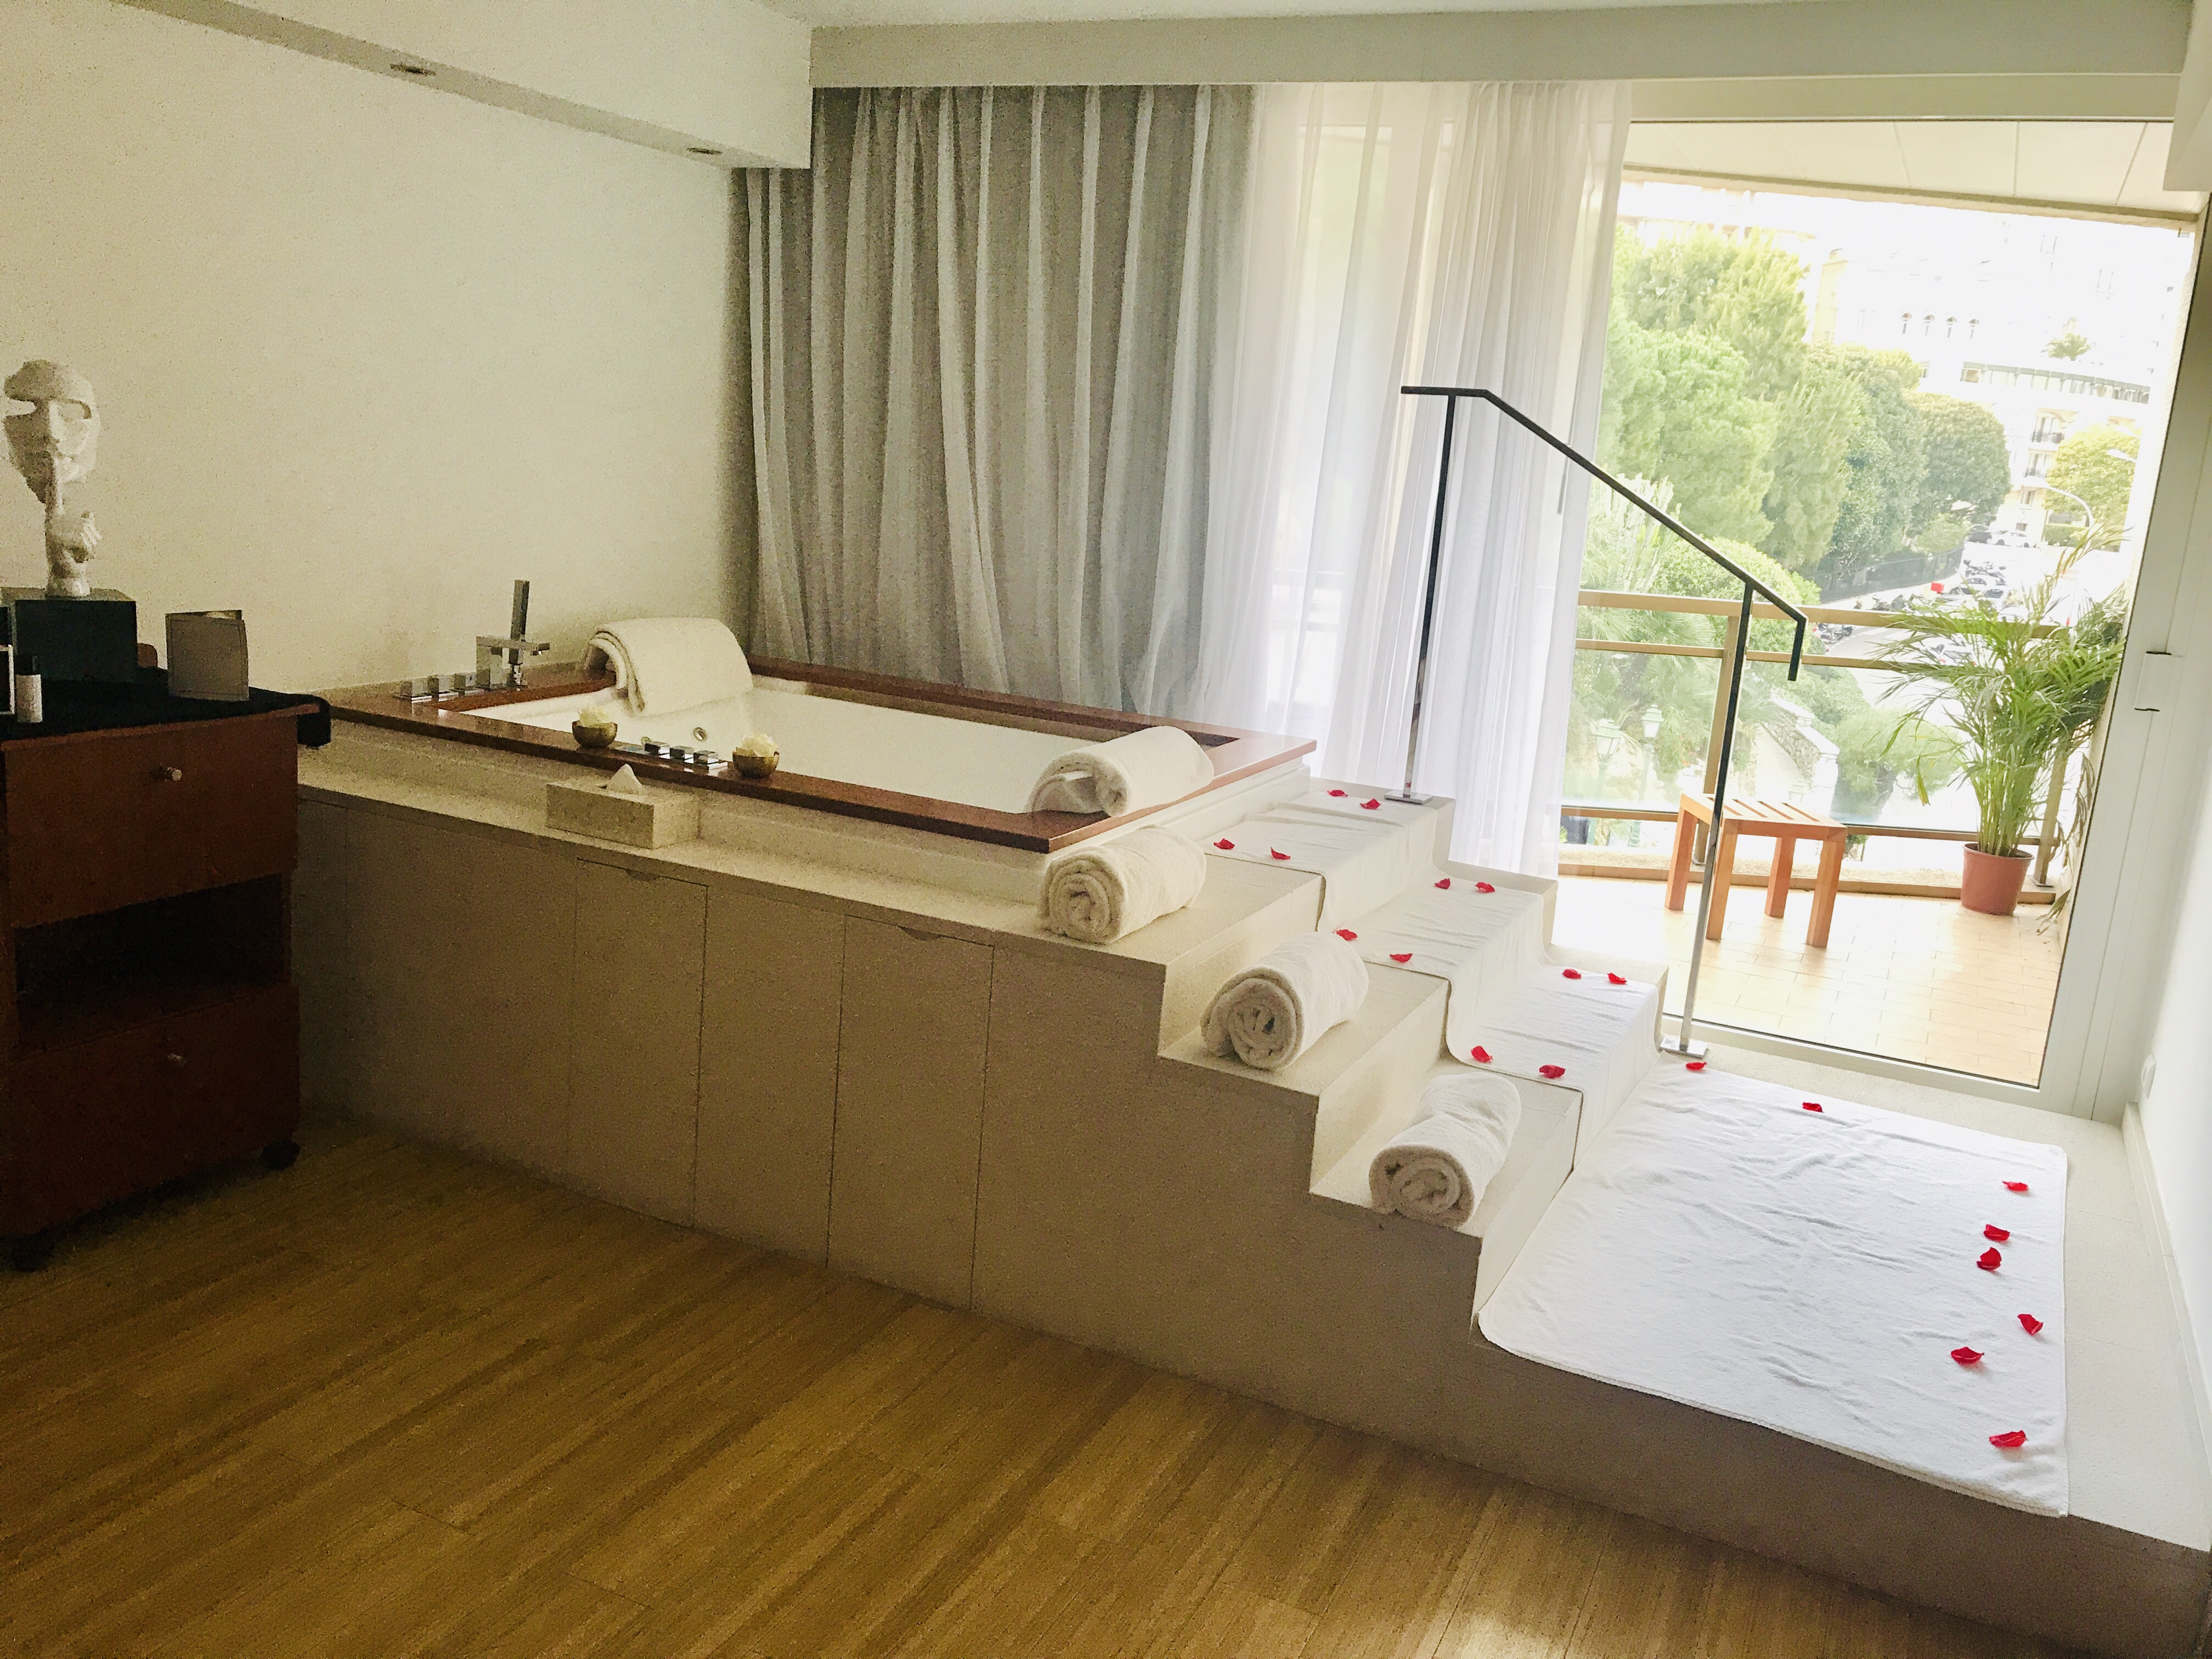 carol-joy-spa-monte-carlo-lustforthesublime